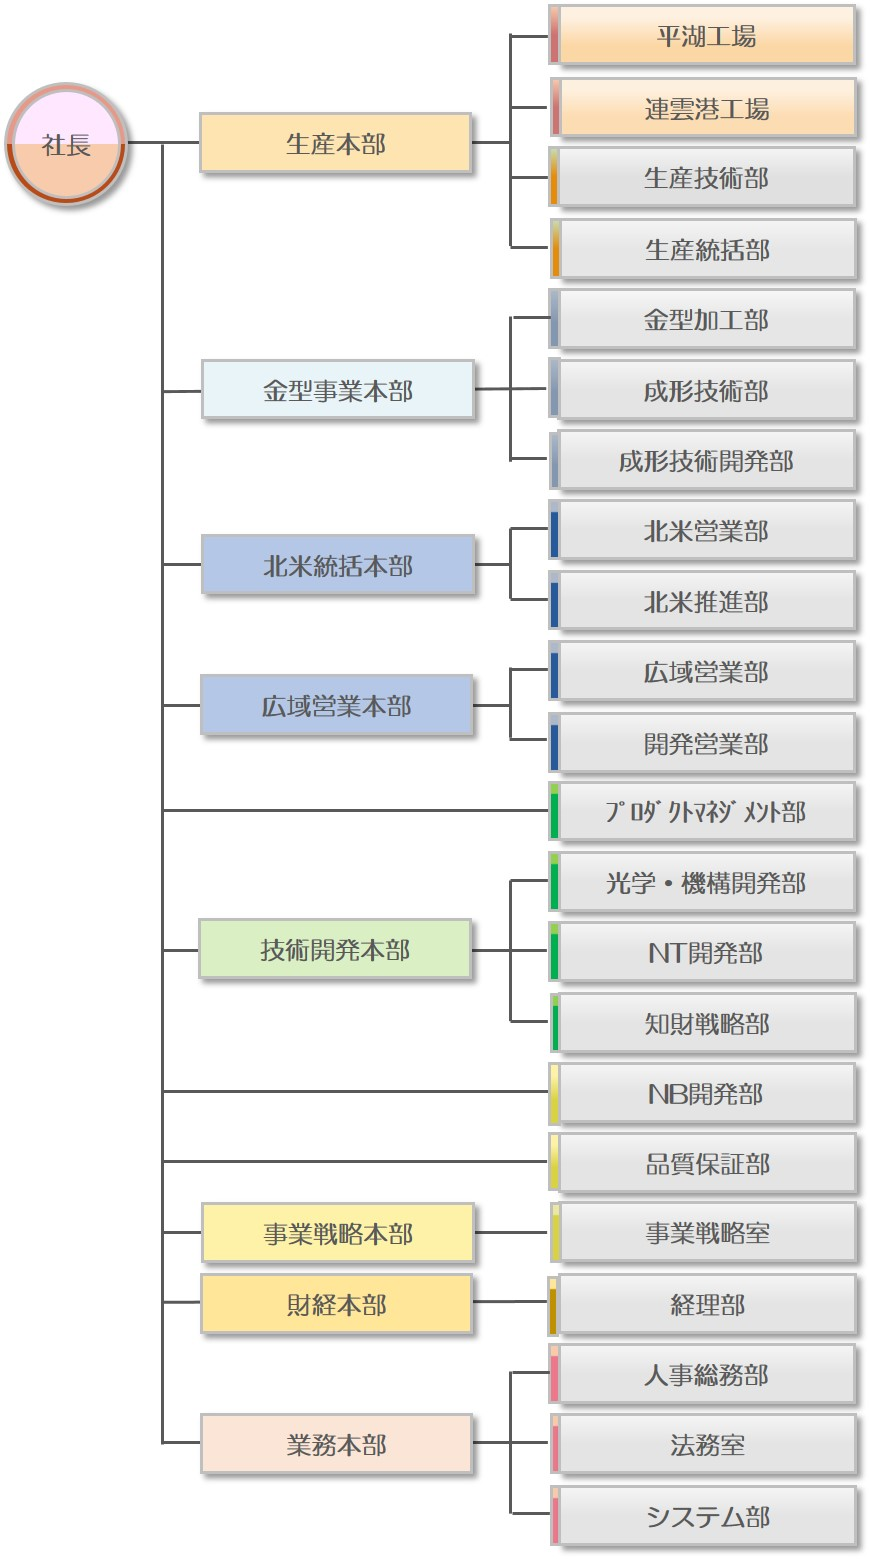 http://kantatsu.co.jp/guide/img/%E5%9B%B3100.jpg